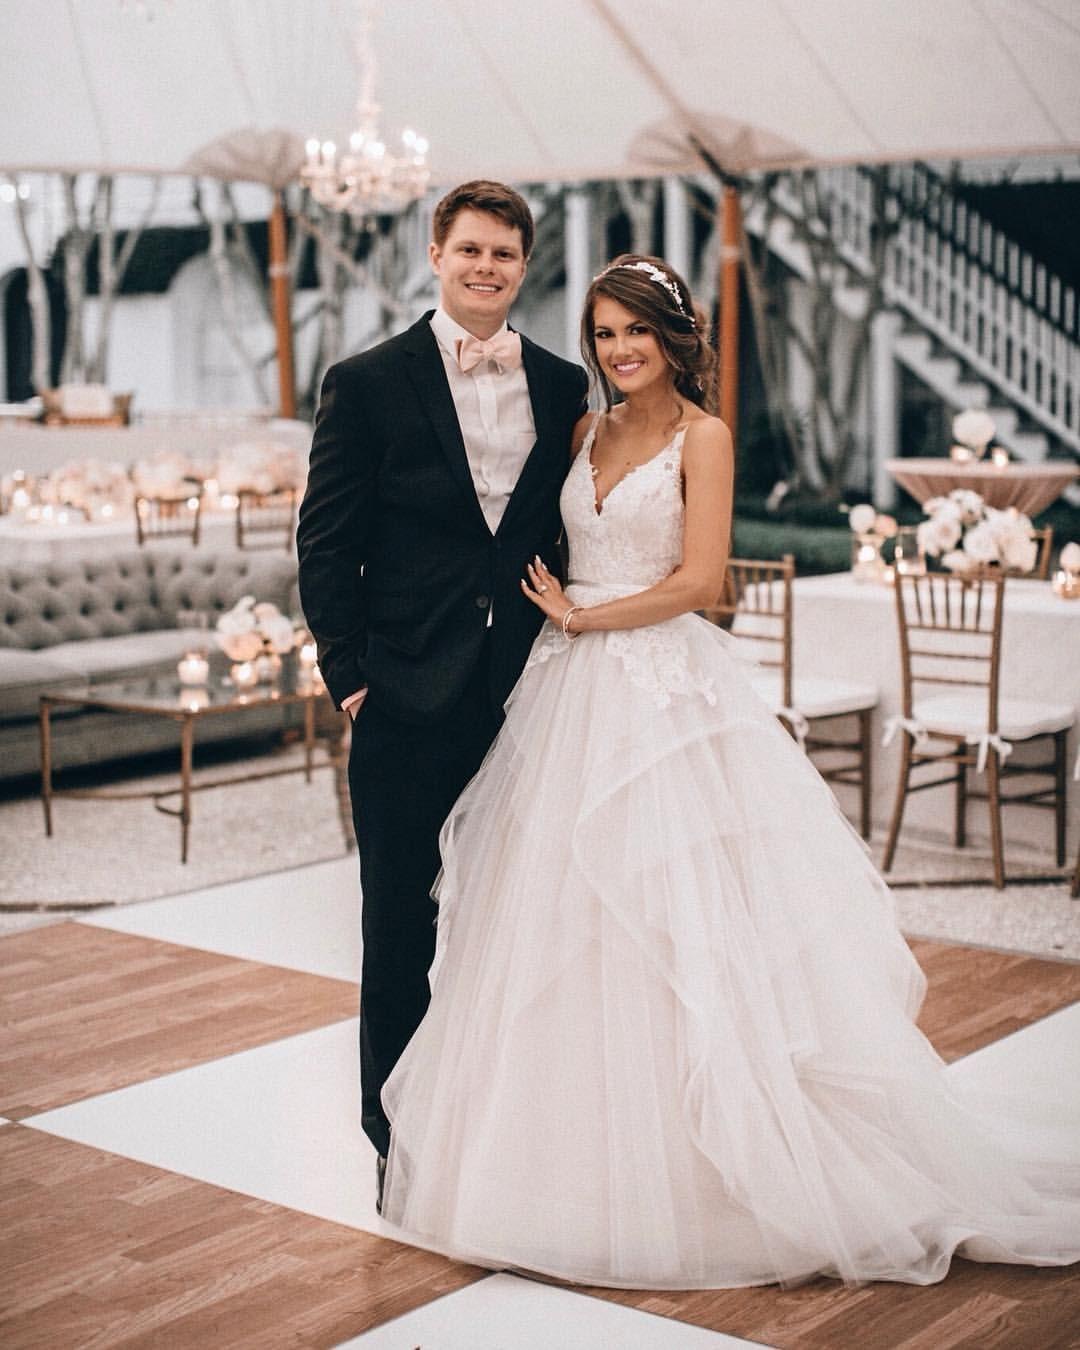 67 9k Likes 833 Comments Caitlin Covington Cmcoving On Instagram Chris I Spent The E Wedding Dresses Wedding Dresses Lace Best Indian Wedding Dresses [ 1350 x 1080 Pixel ]